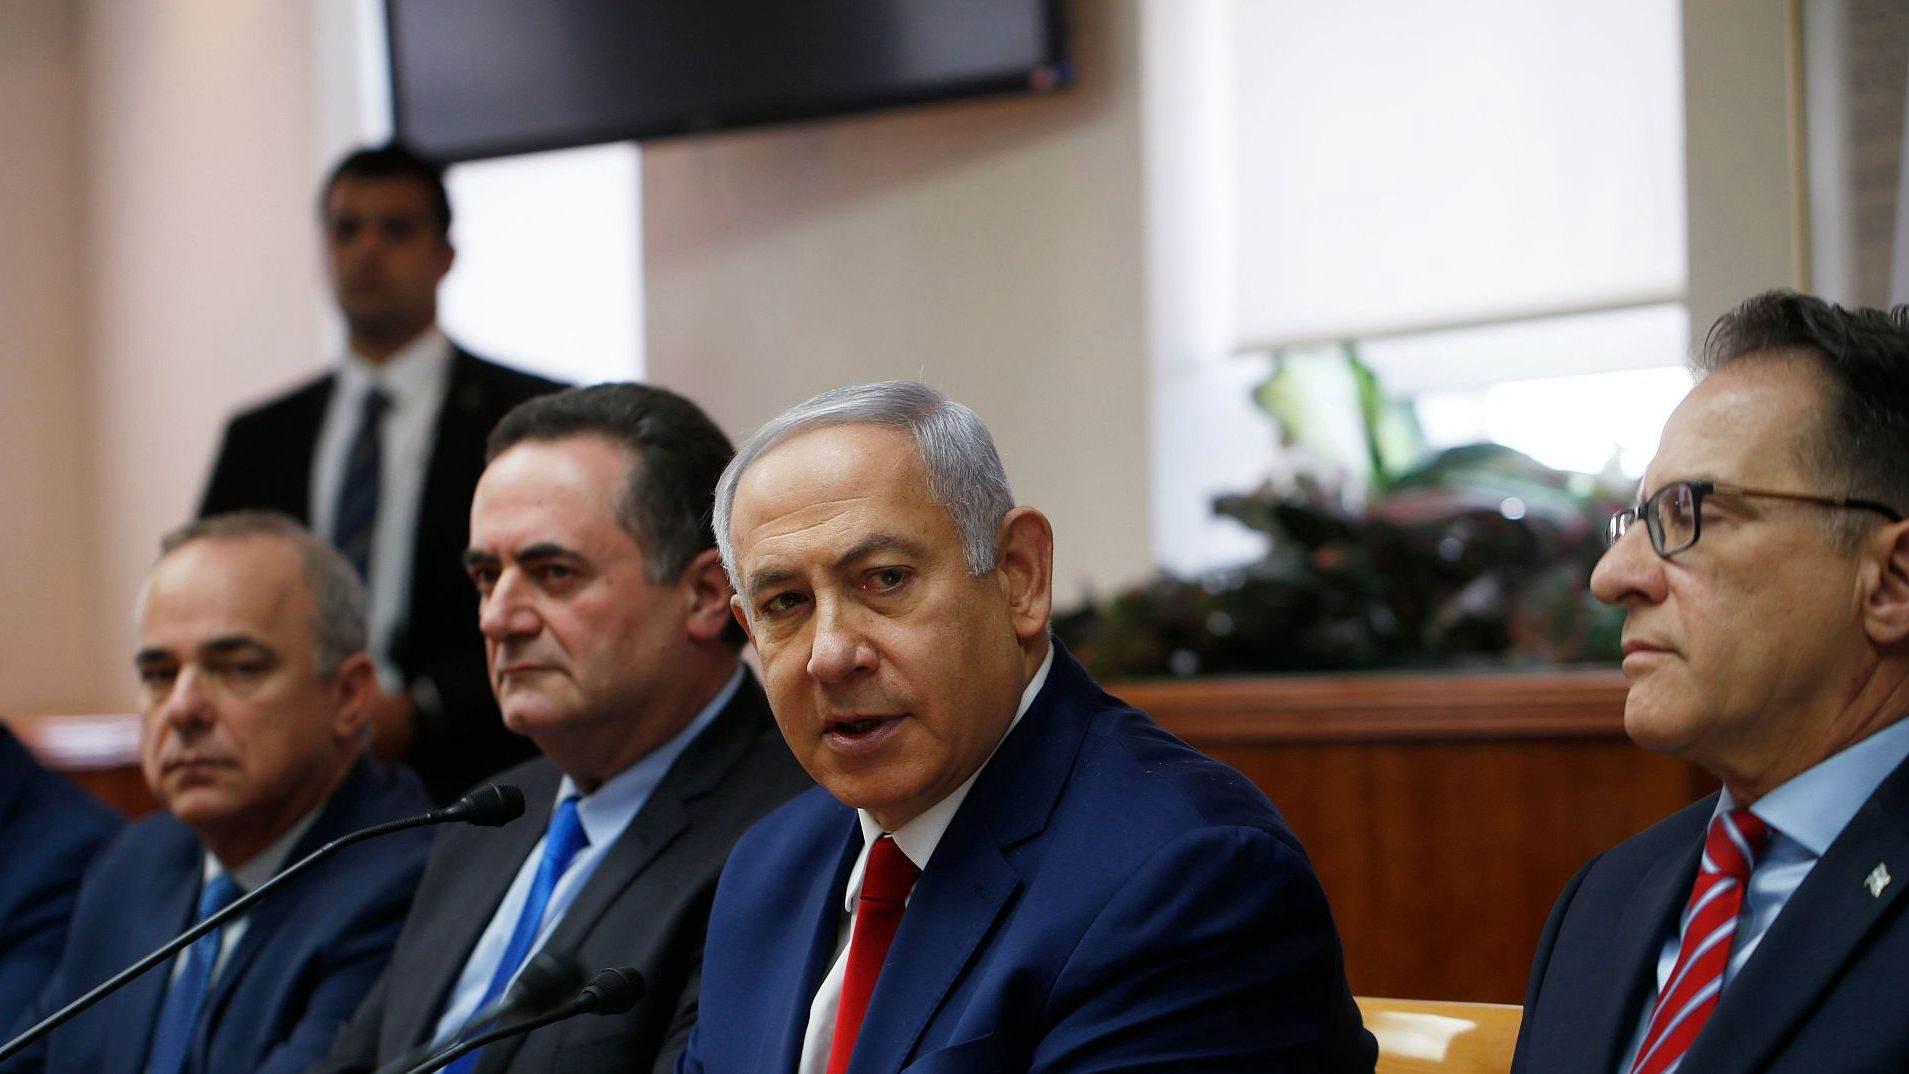 Israel's early election: Netanyahu remains popular despite corruption investigation